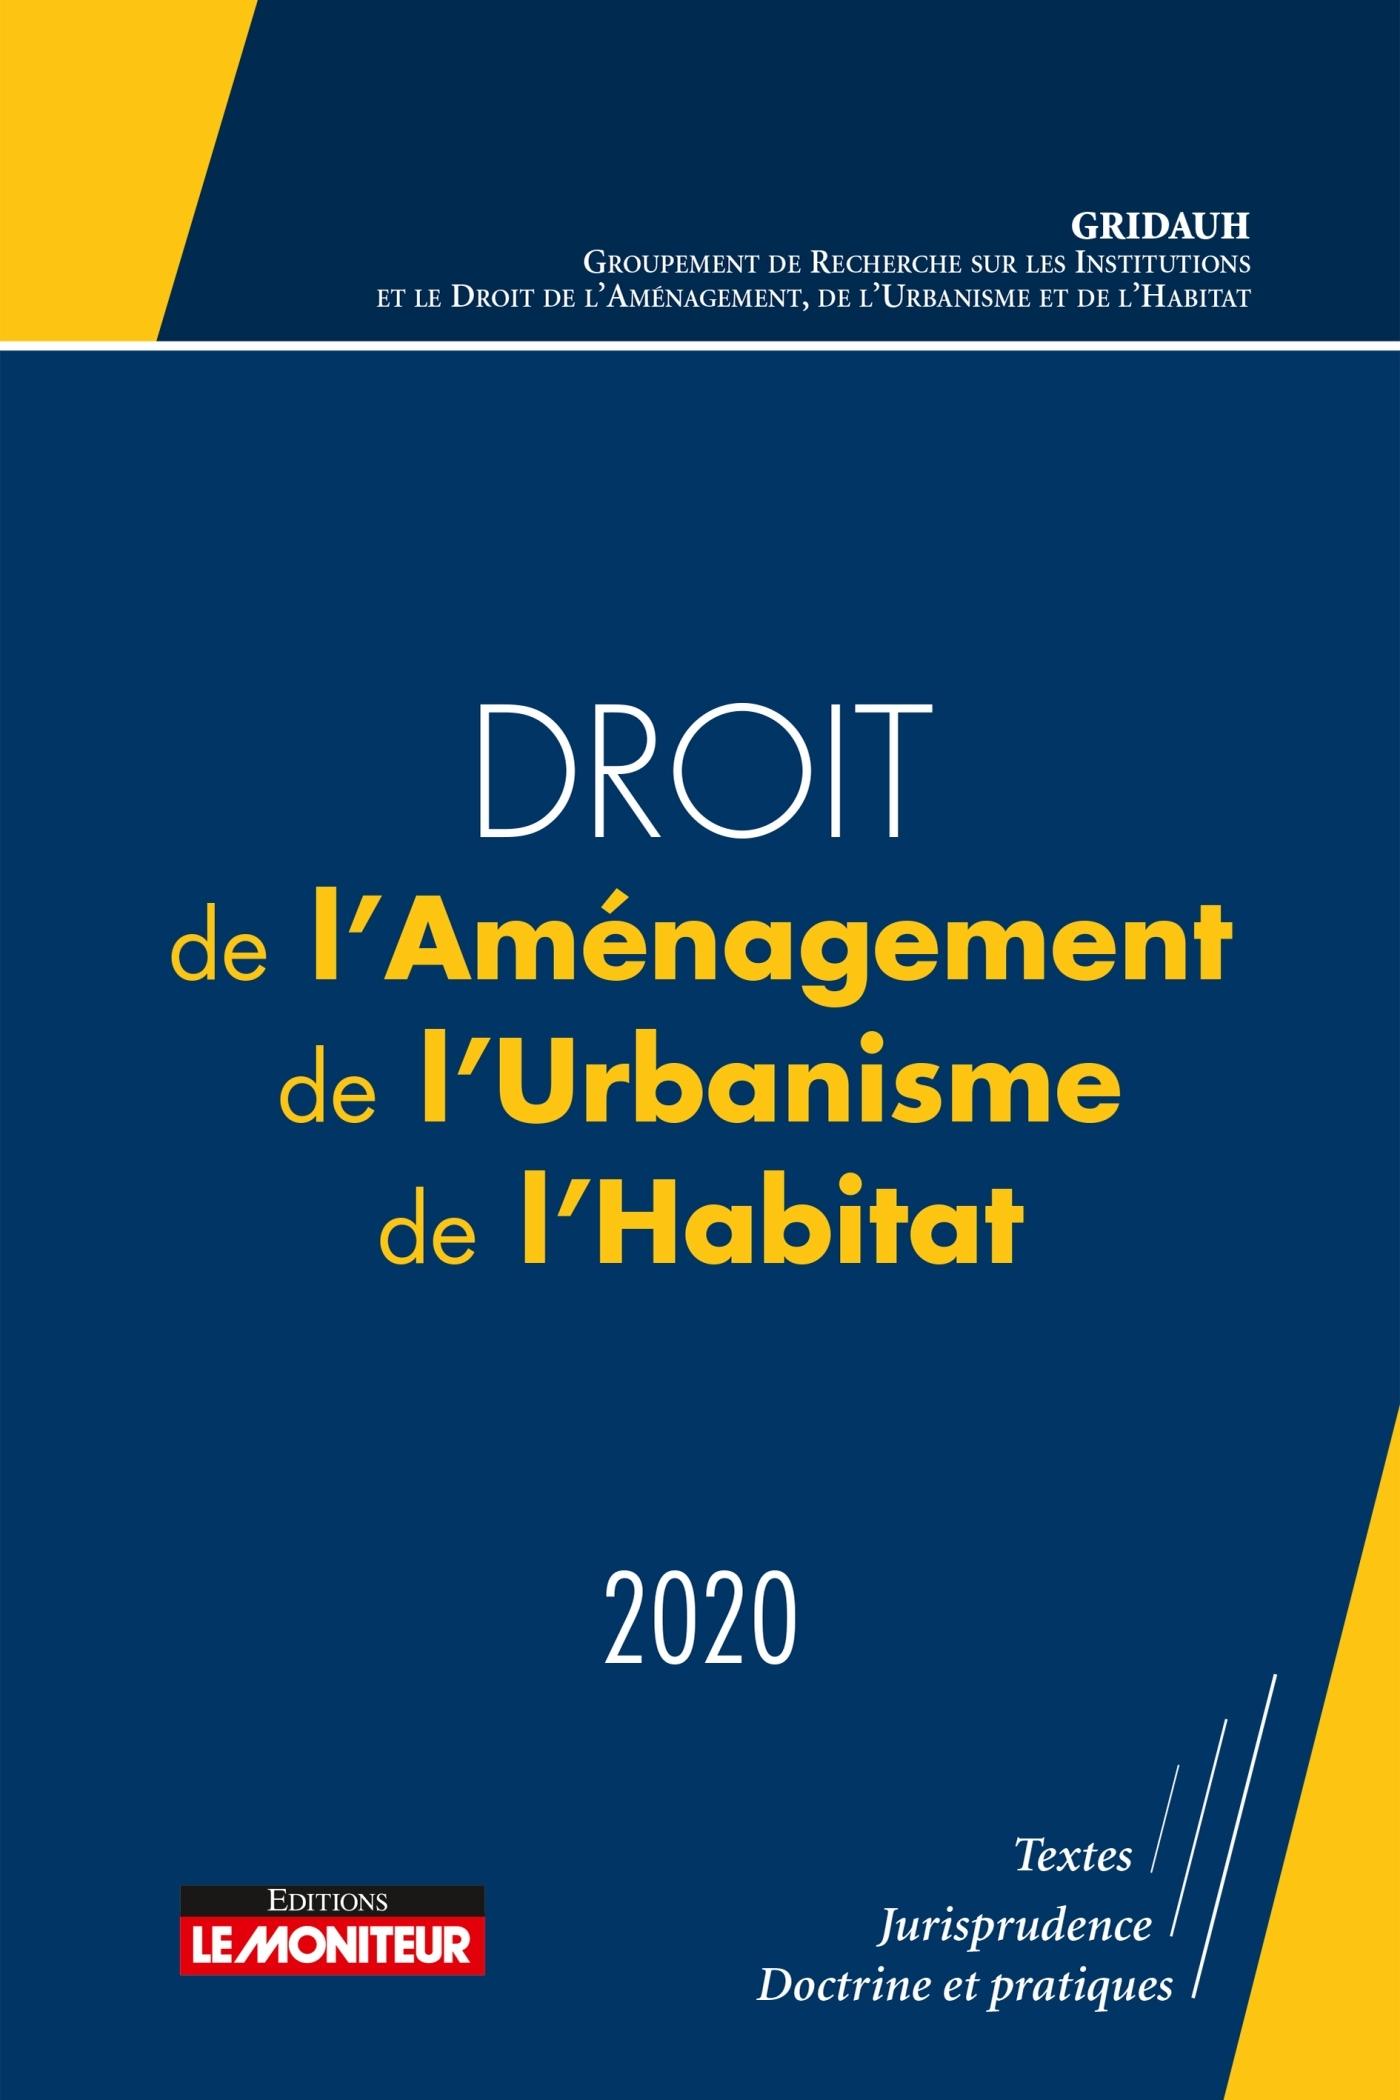 DROIT DE L'AMENAGEMENT, DE L'URBANISME ET DE L'HABITAT 2020